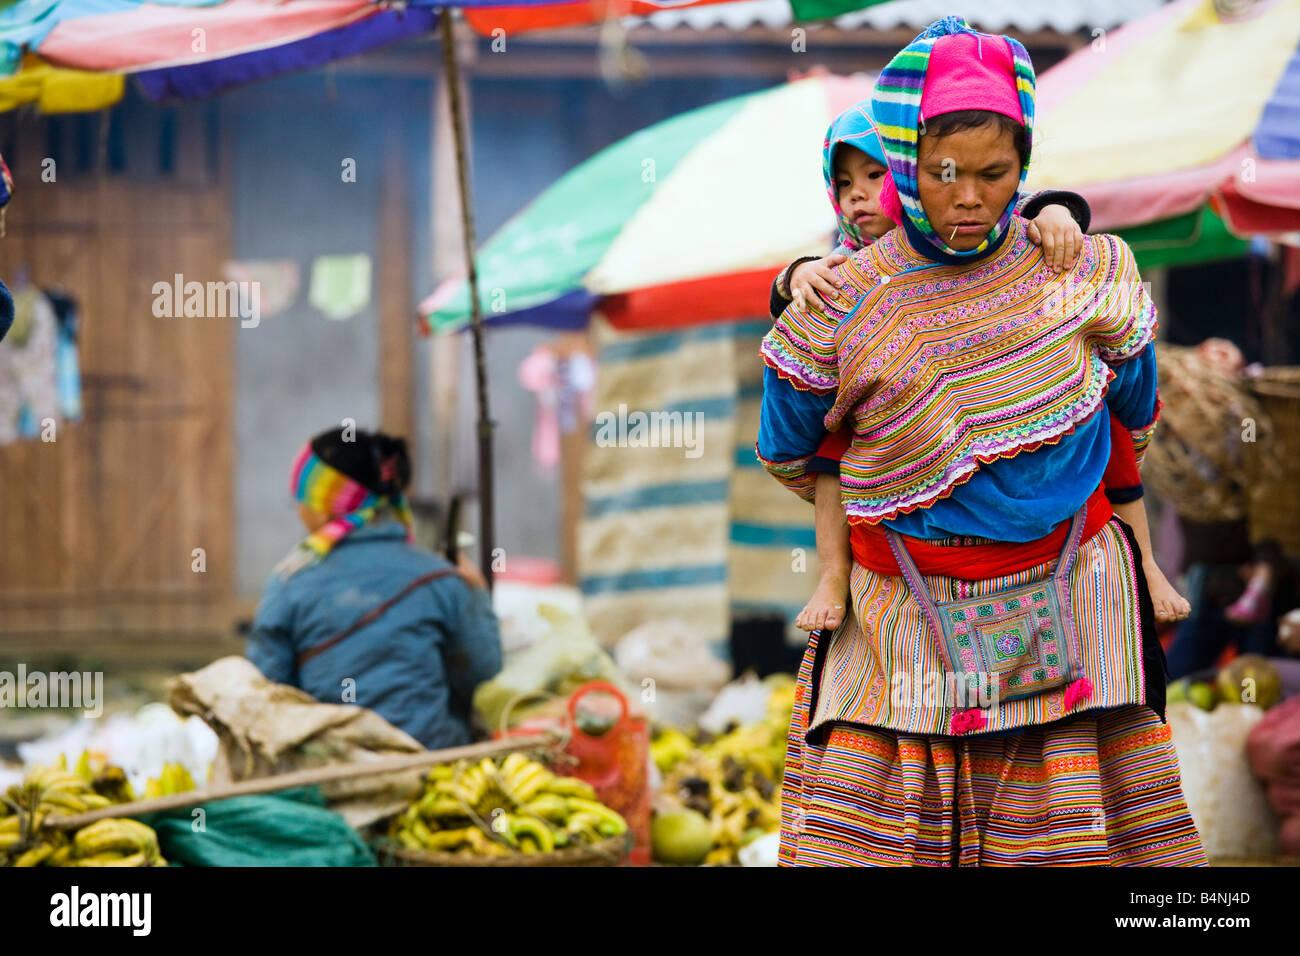 Flower Hmong woman at the Sunday market; Bac Ha, Vietnam Stock Photo